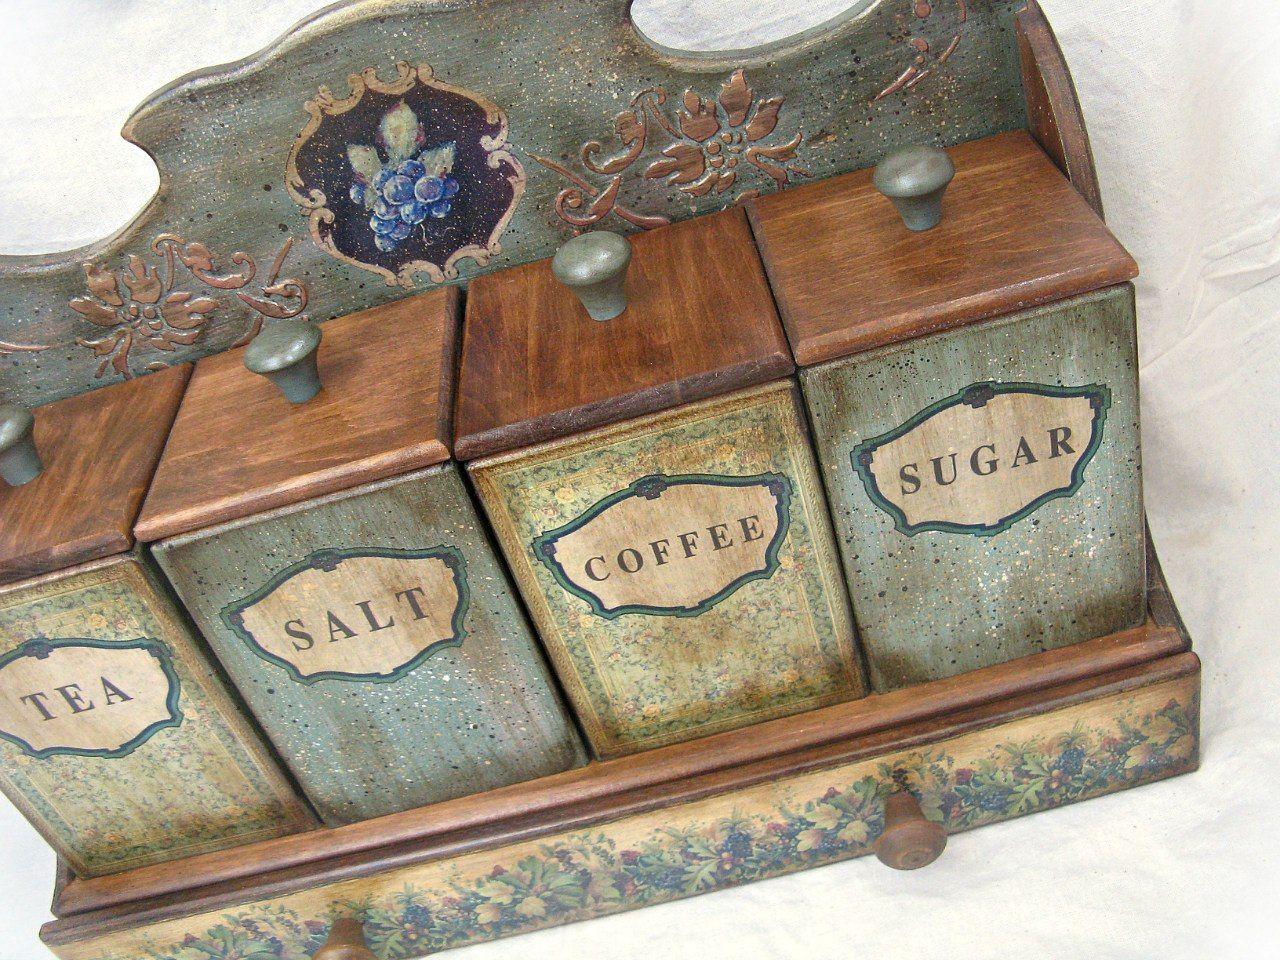 Pin de roxana noemi fredes en arte | Pinterest | Caja de madera ...